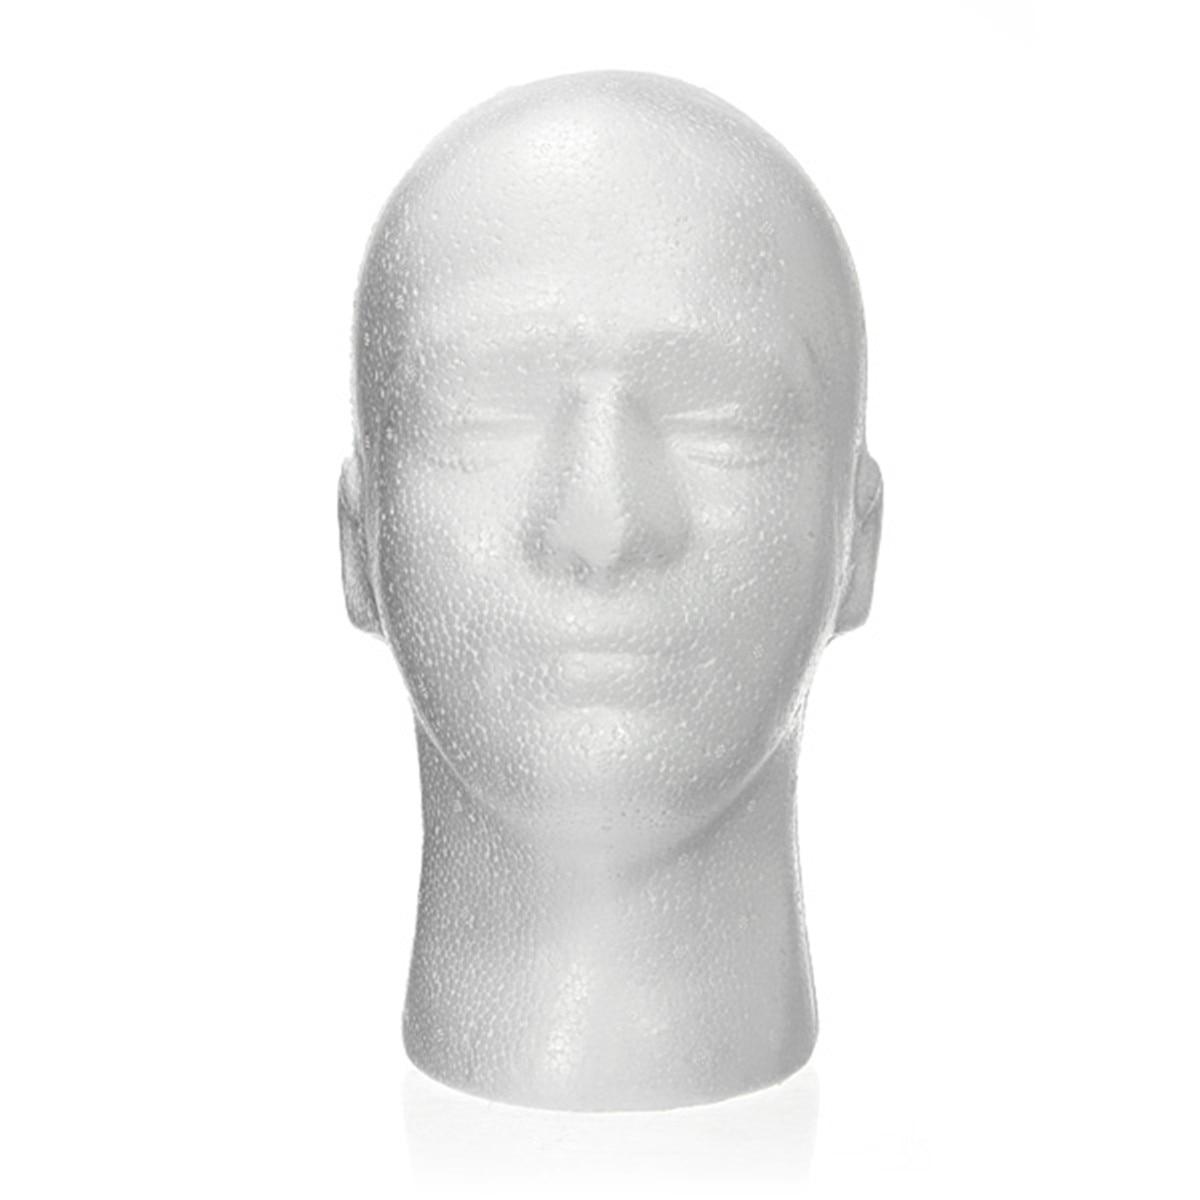 5 unids/set de maniquí masculino de espuma de poliestireno cabeza de maniquí profesional modelo de soporte de peluca gafas sombrero diadema soporte de exhibición